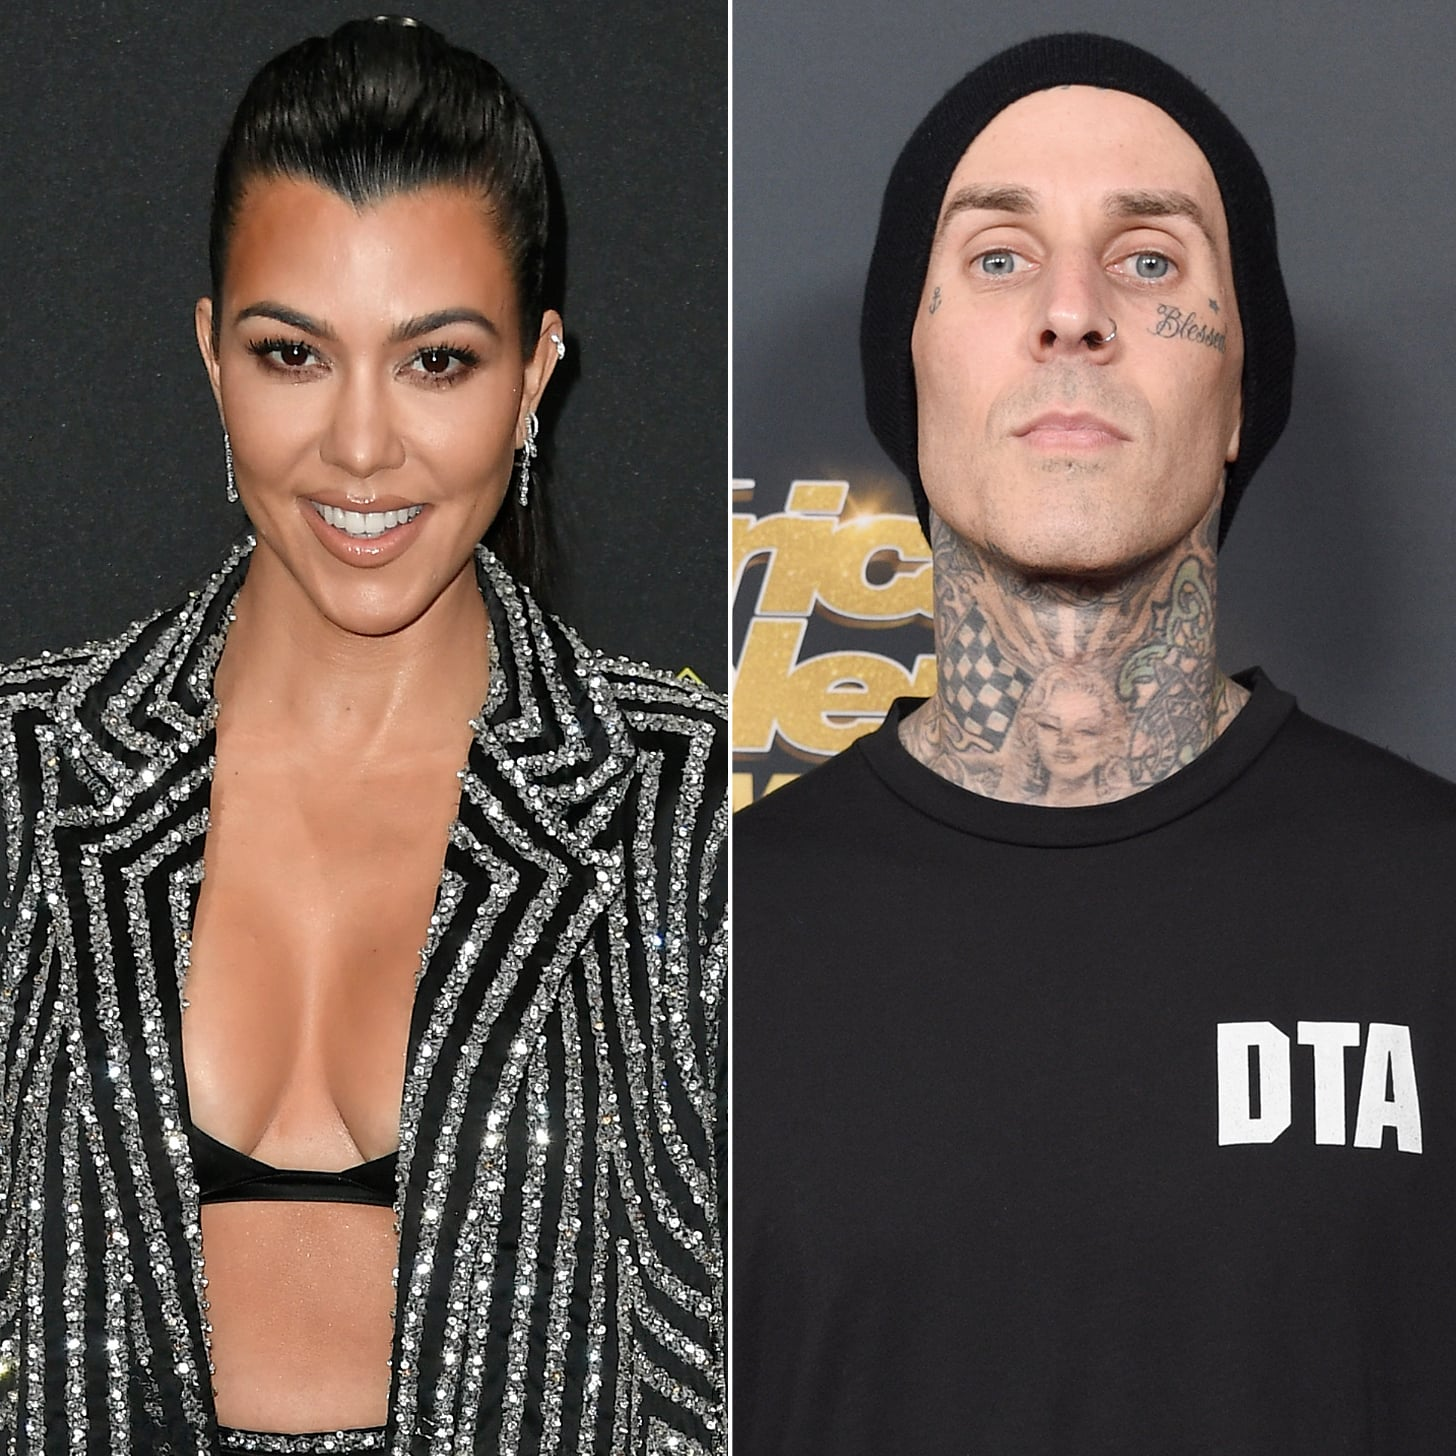 Kourtney Kardashian's Love Note For Travis Barker Is, Um, Unconventional